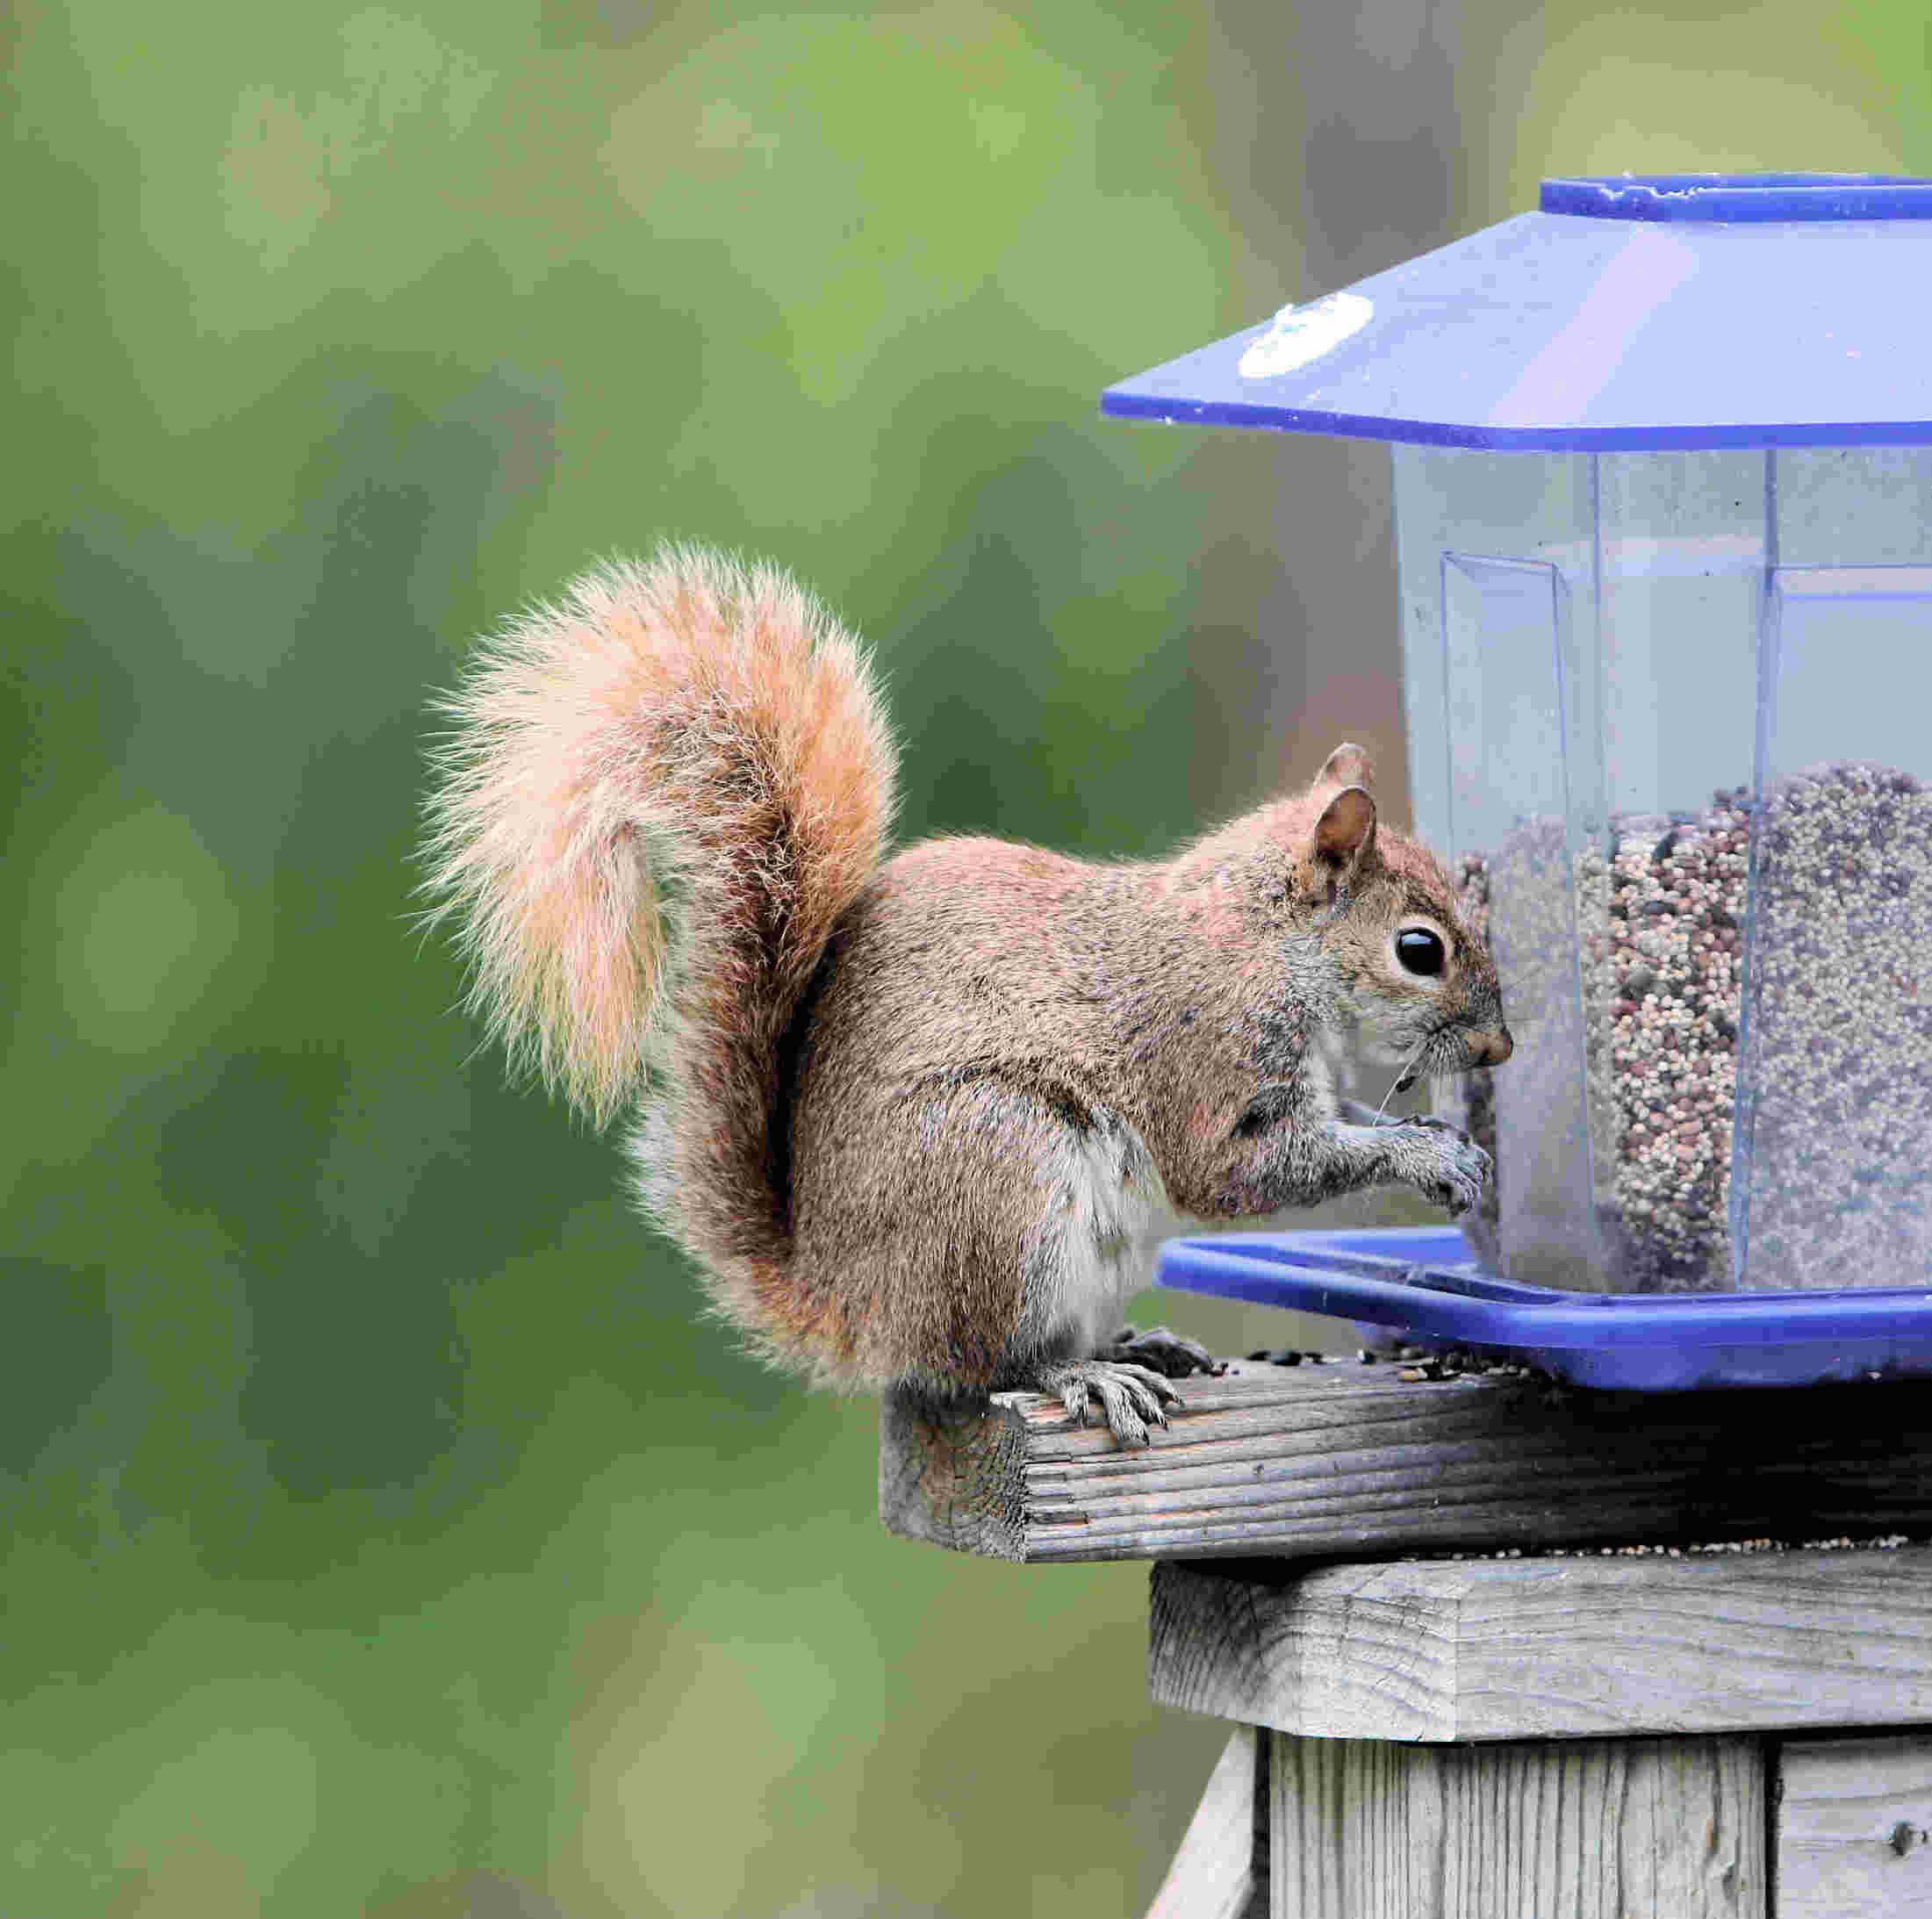 Best Way To Keep Squirrels Away From Bird Feeders How To Keep Squirrels Out Of Bird Feeders